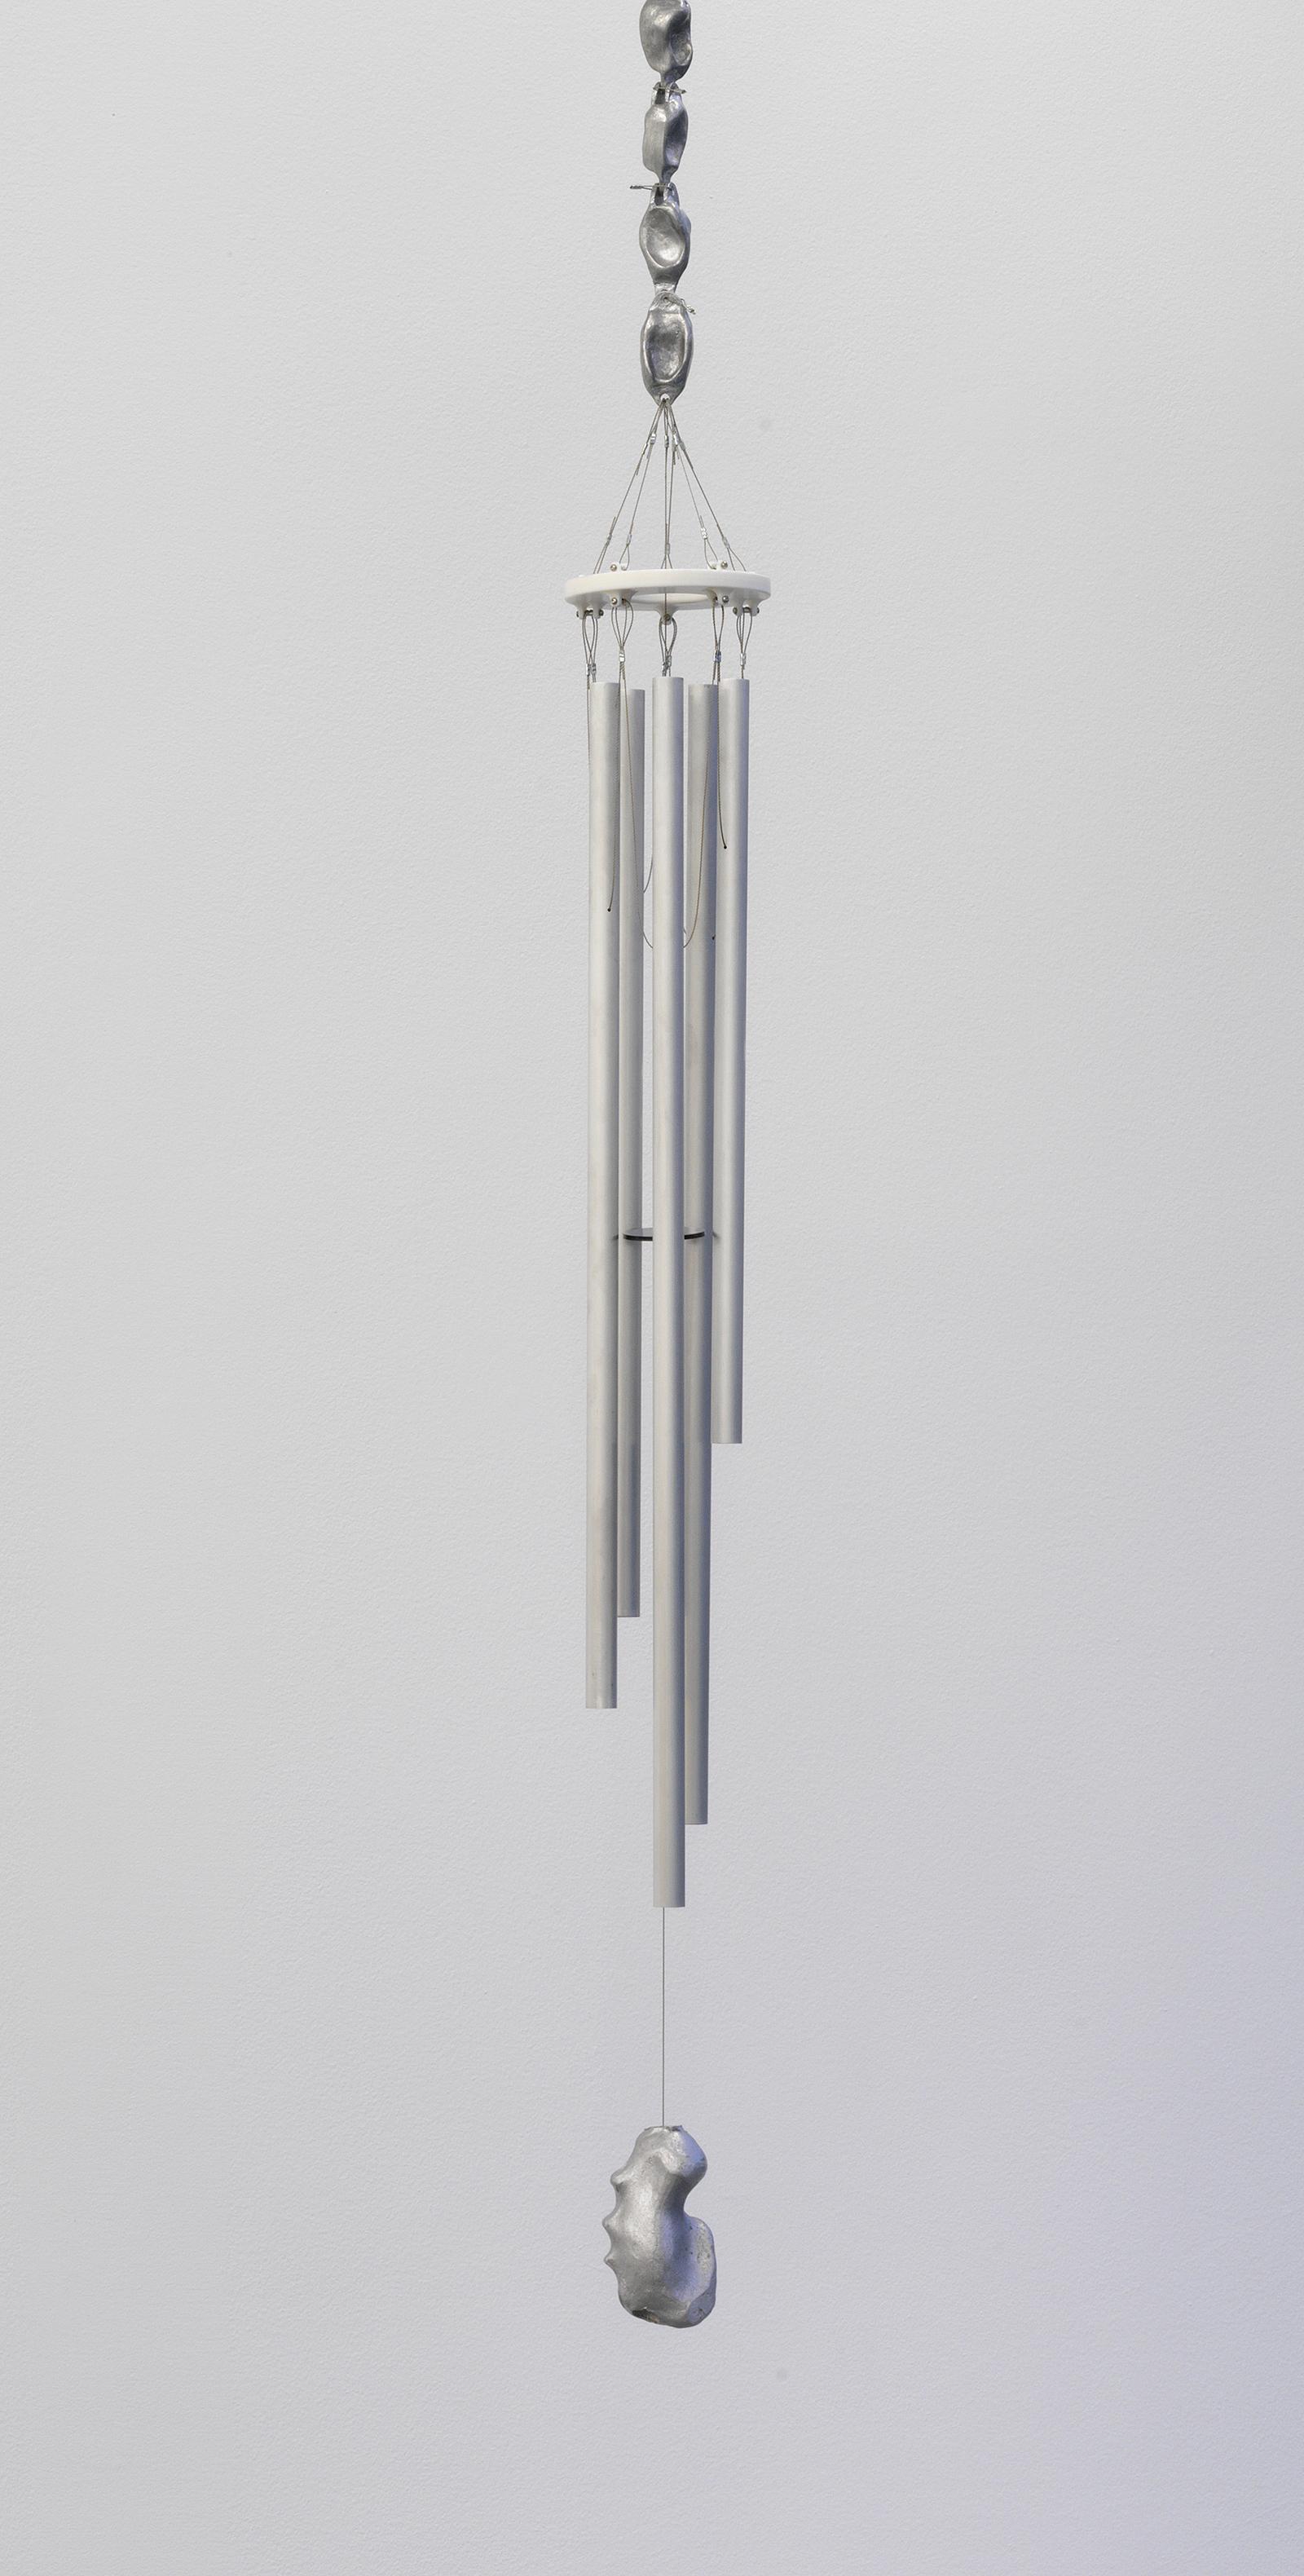 Untitled (Chimes) - Daniel G. Baird